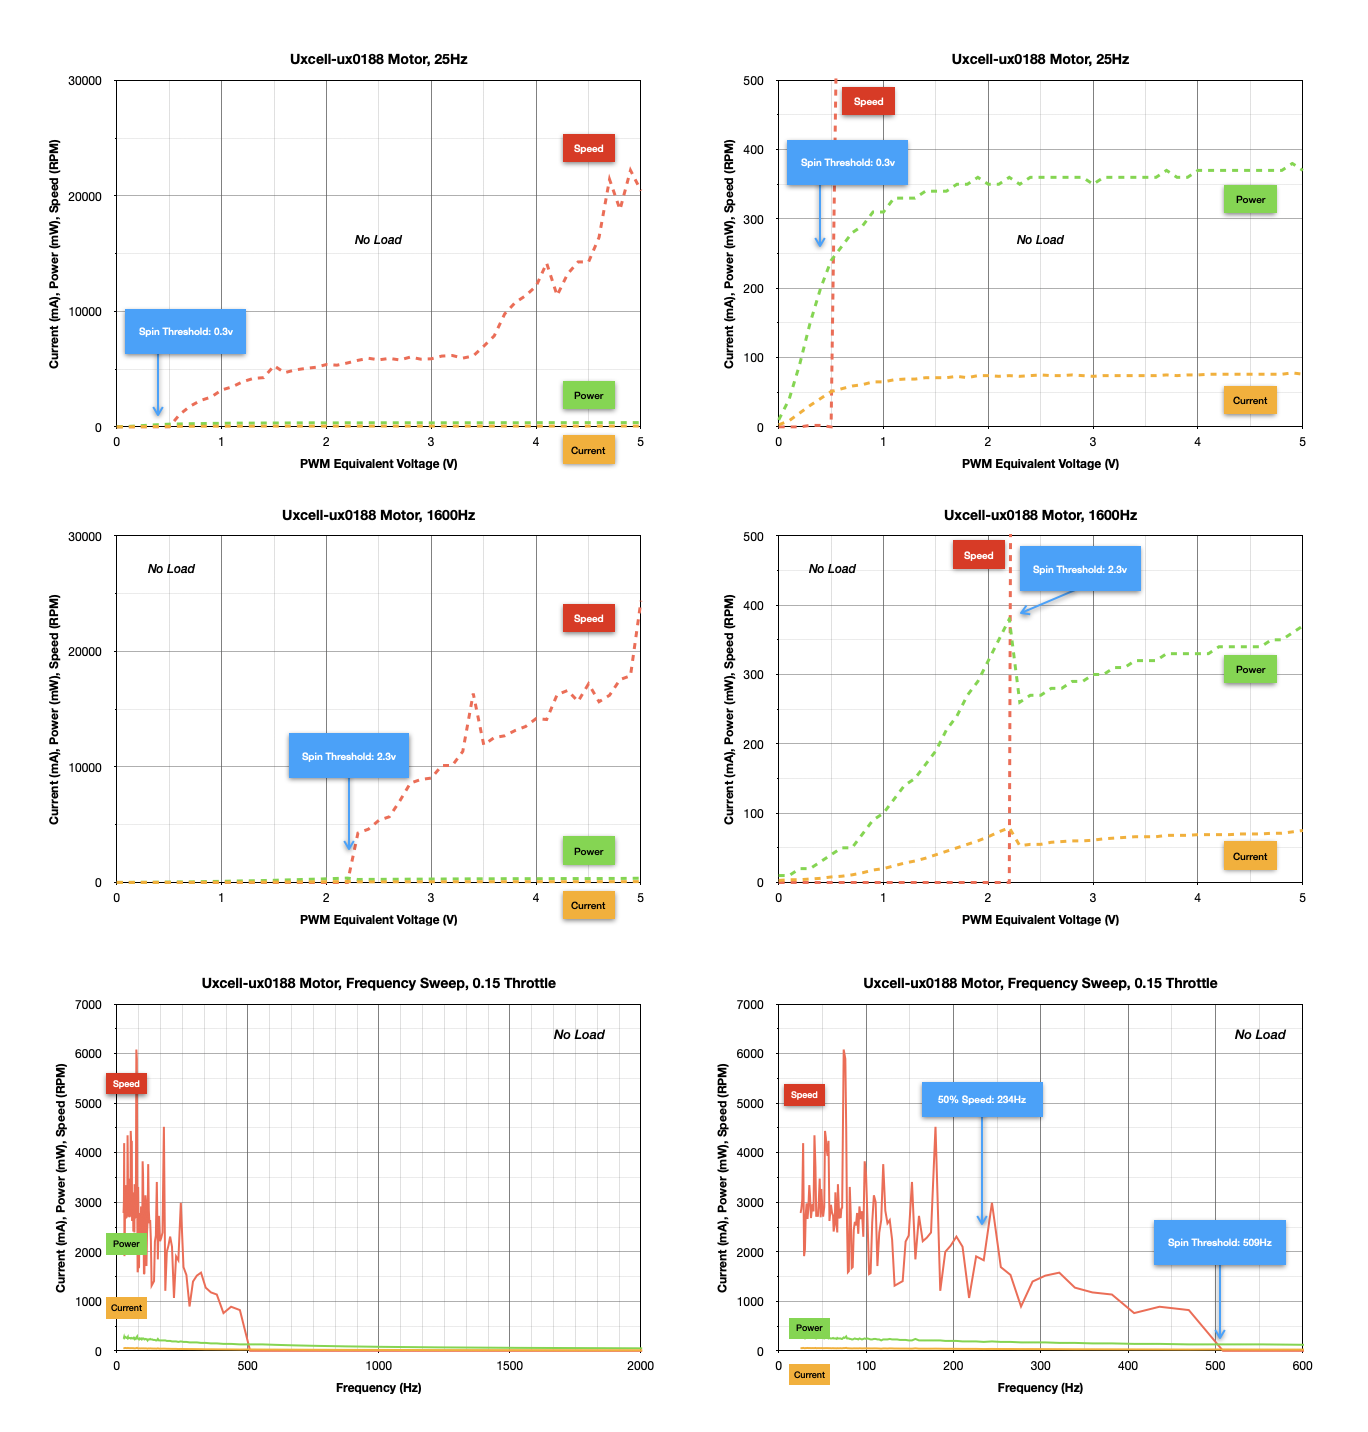 robotics___cnc_Uxcell-ux0188_Motor_Summary_Graphs.png